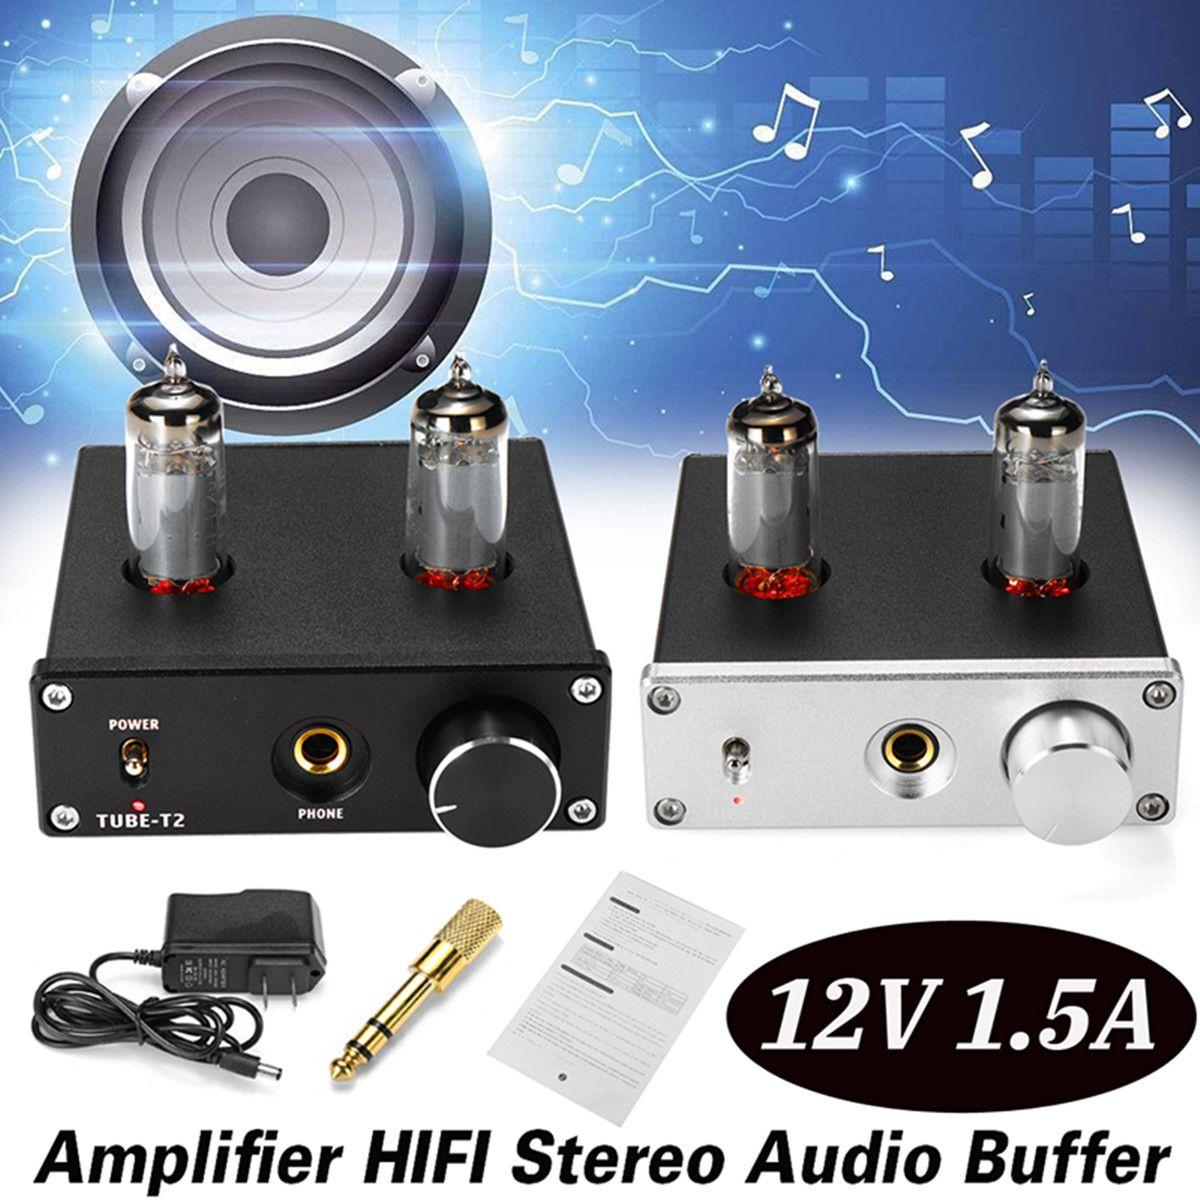 Amplifier HIFI Stereo Audio Buffer 12V 1.5A 6K4 Vacuum Tube Preamplifier Desktop Amplifier Home Video